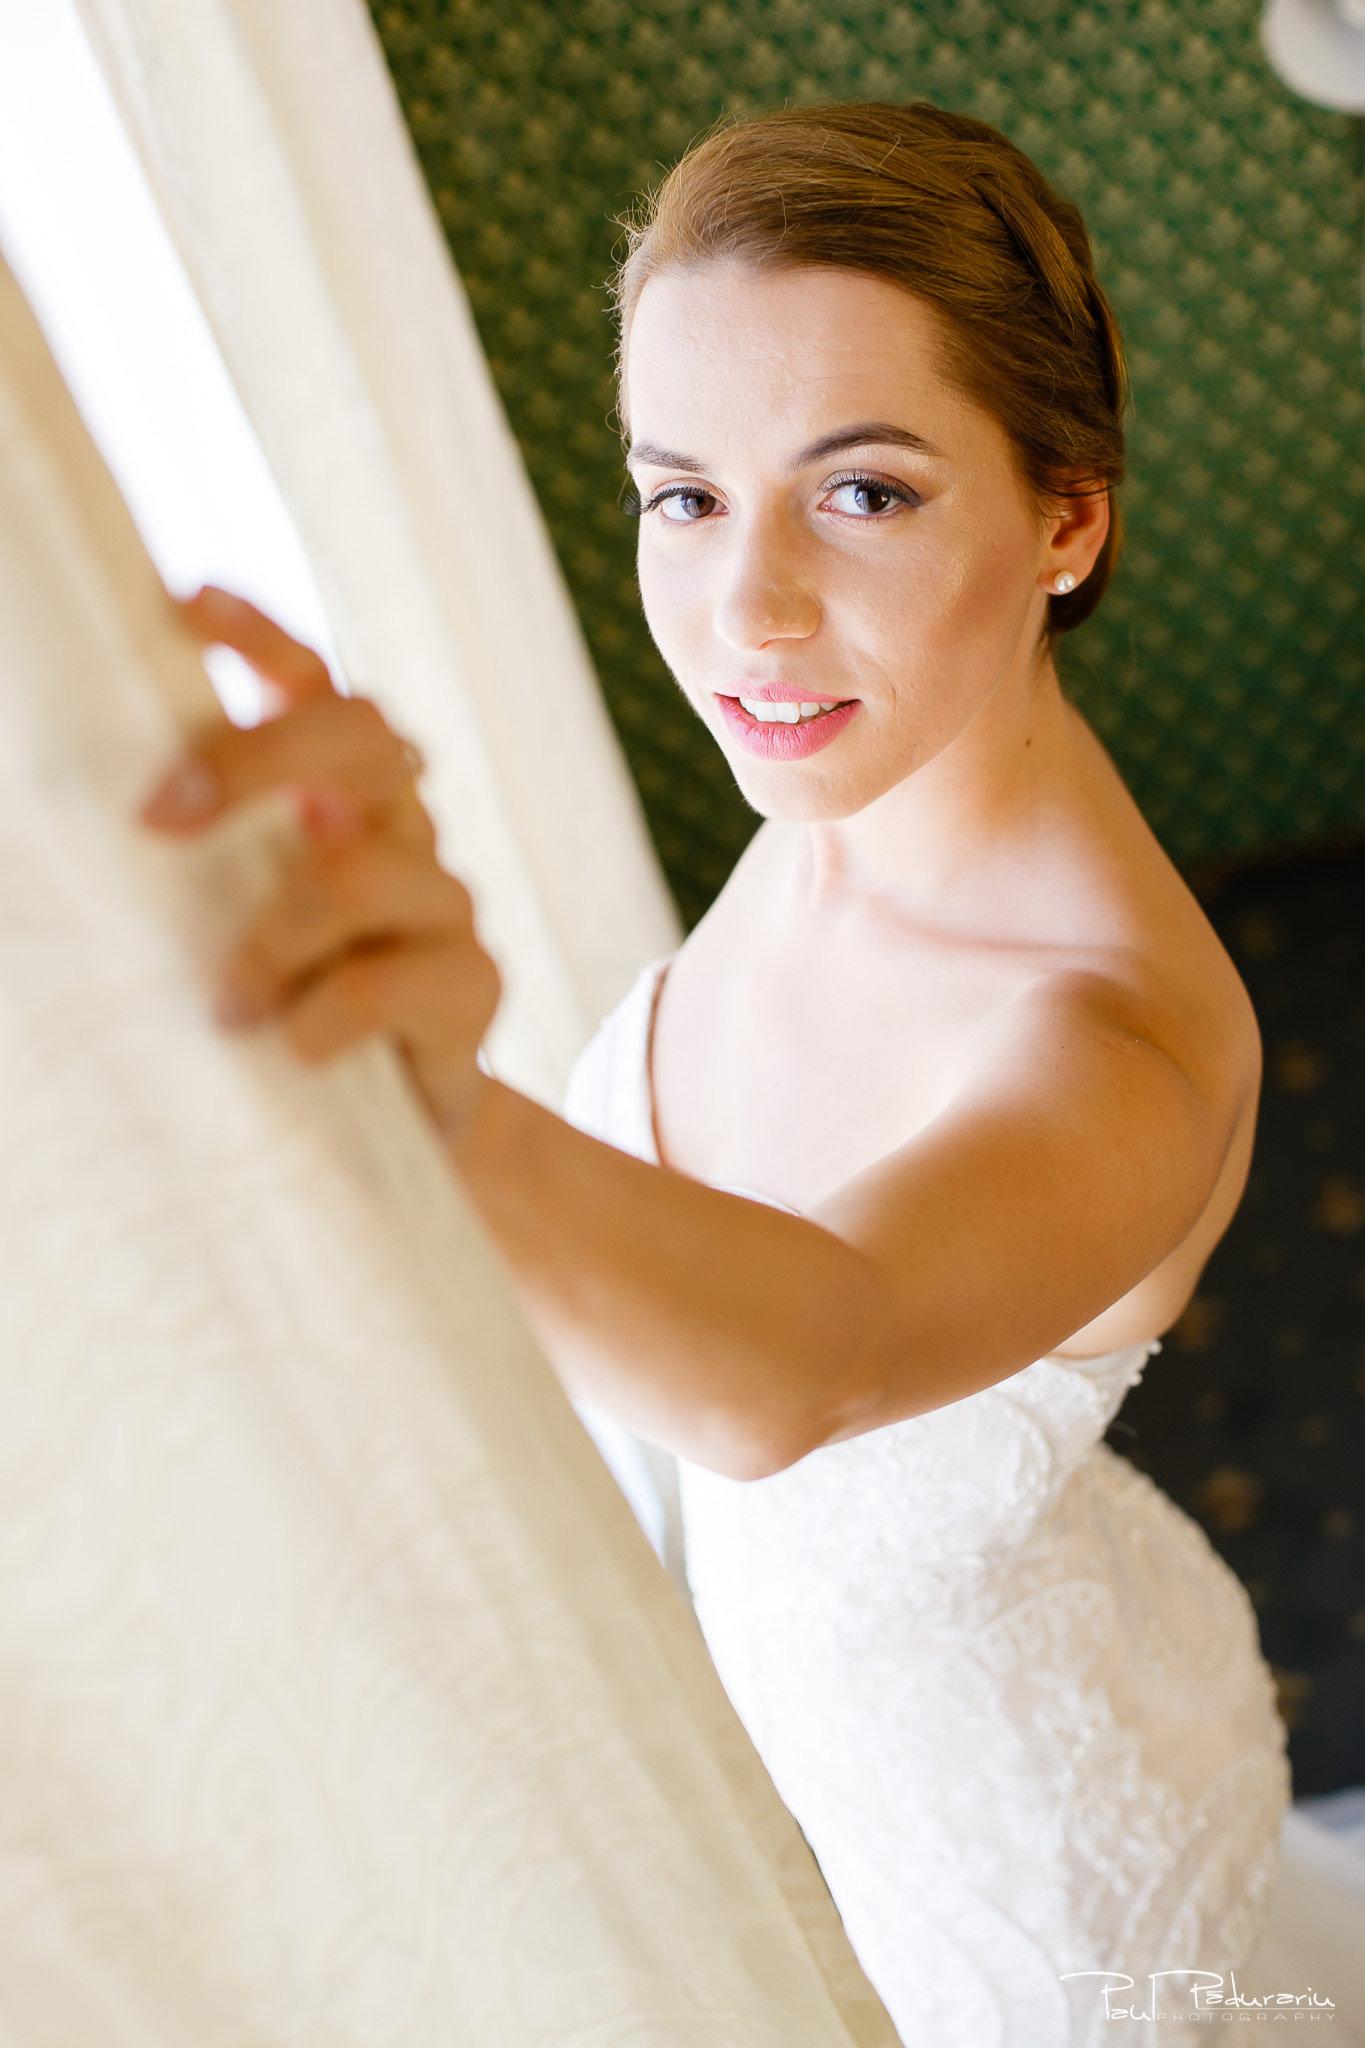 Roxana si Silviu Nunta Hotel Eden Iasi - pregatiri - mireasa si rochia - fotograf profesionist nunta www.paulpadurariu.ro © 2017 Paul Padurariu